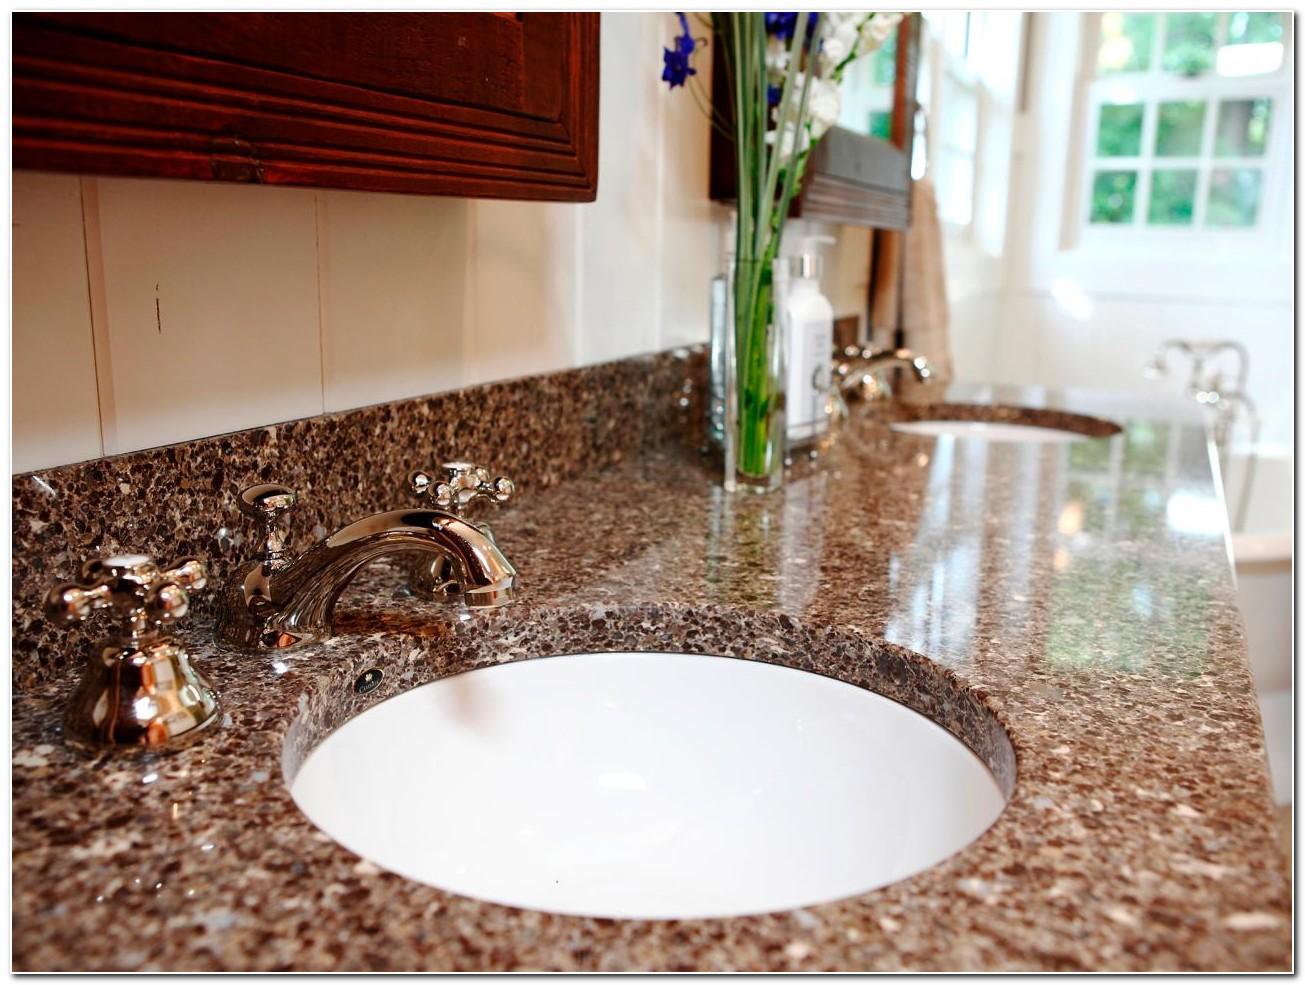 Installing Granite Vanity Top With Undermount Sink